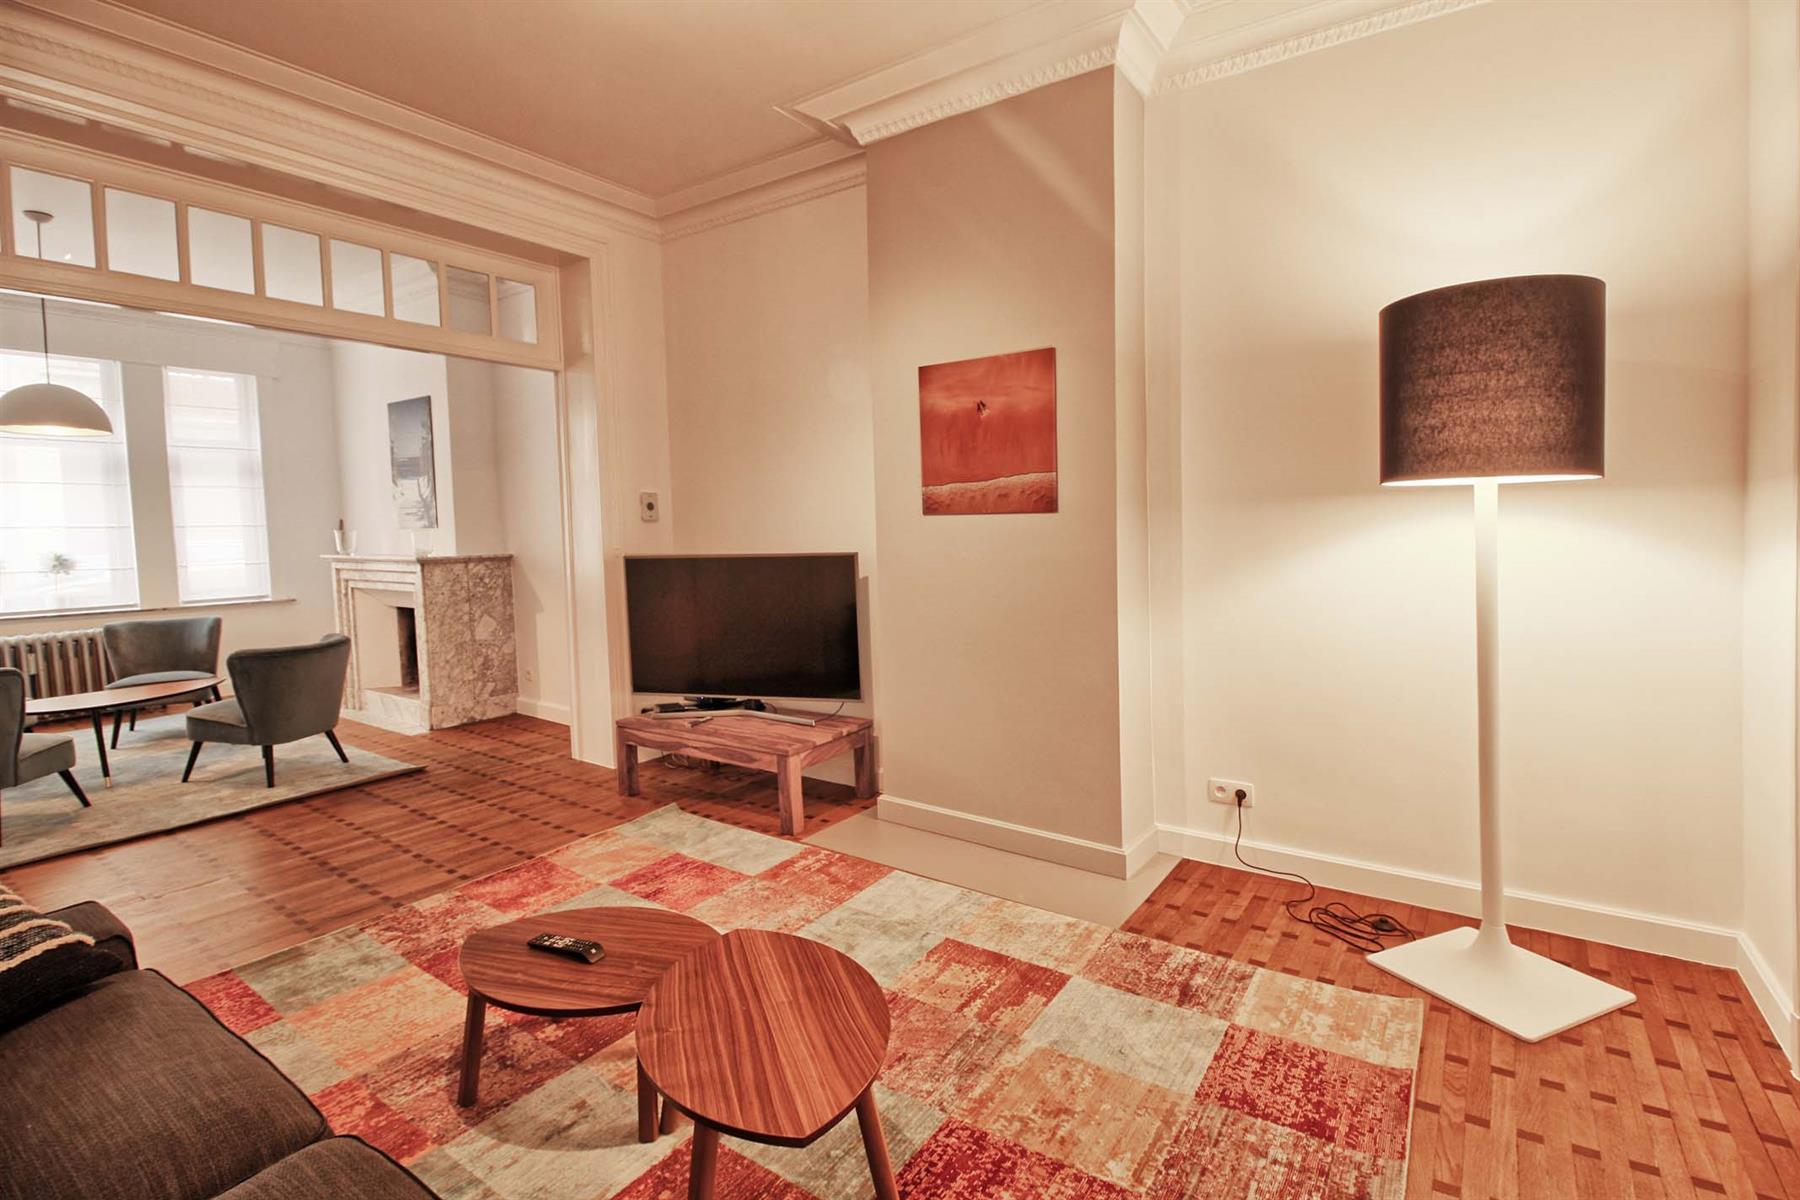 Maison - Ixelles - #4106764-1